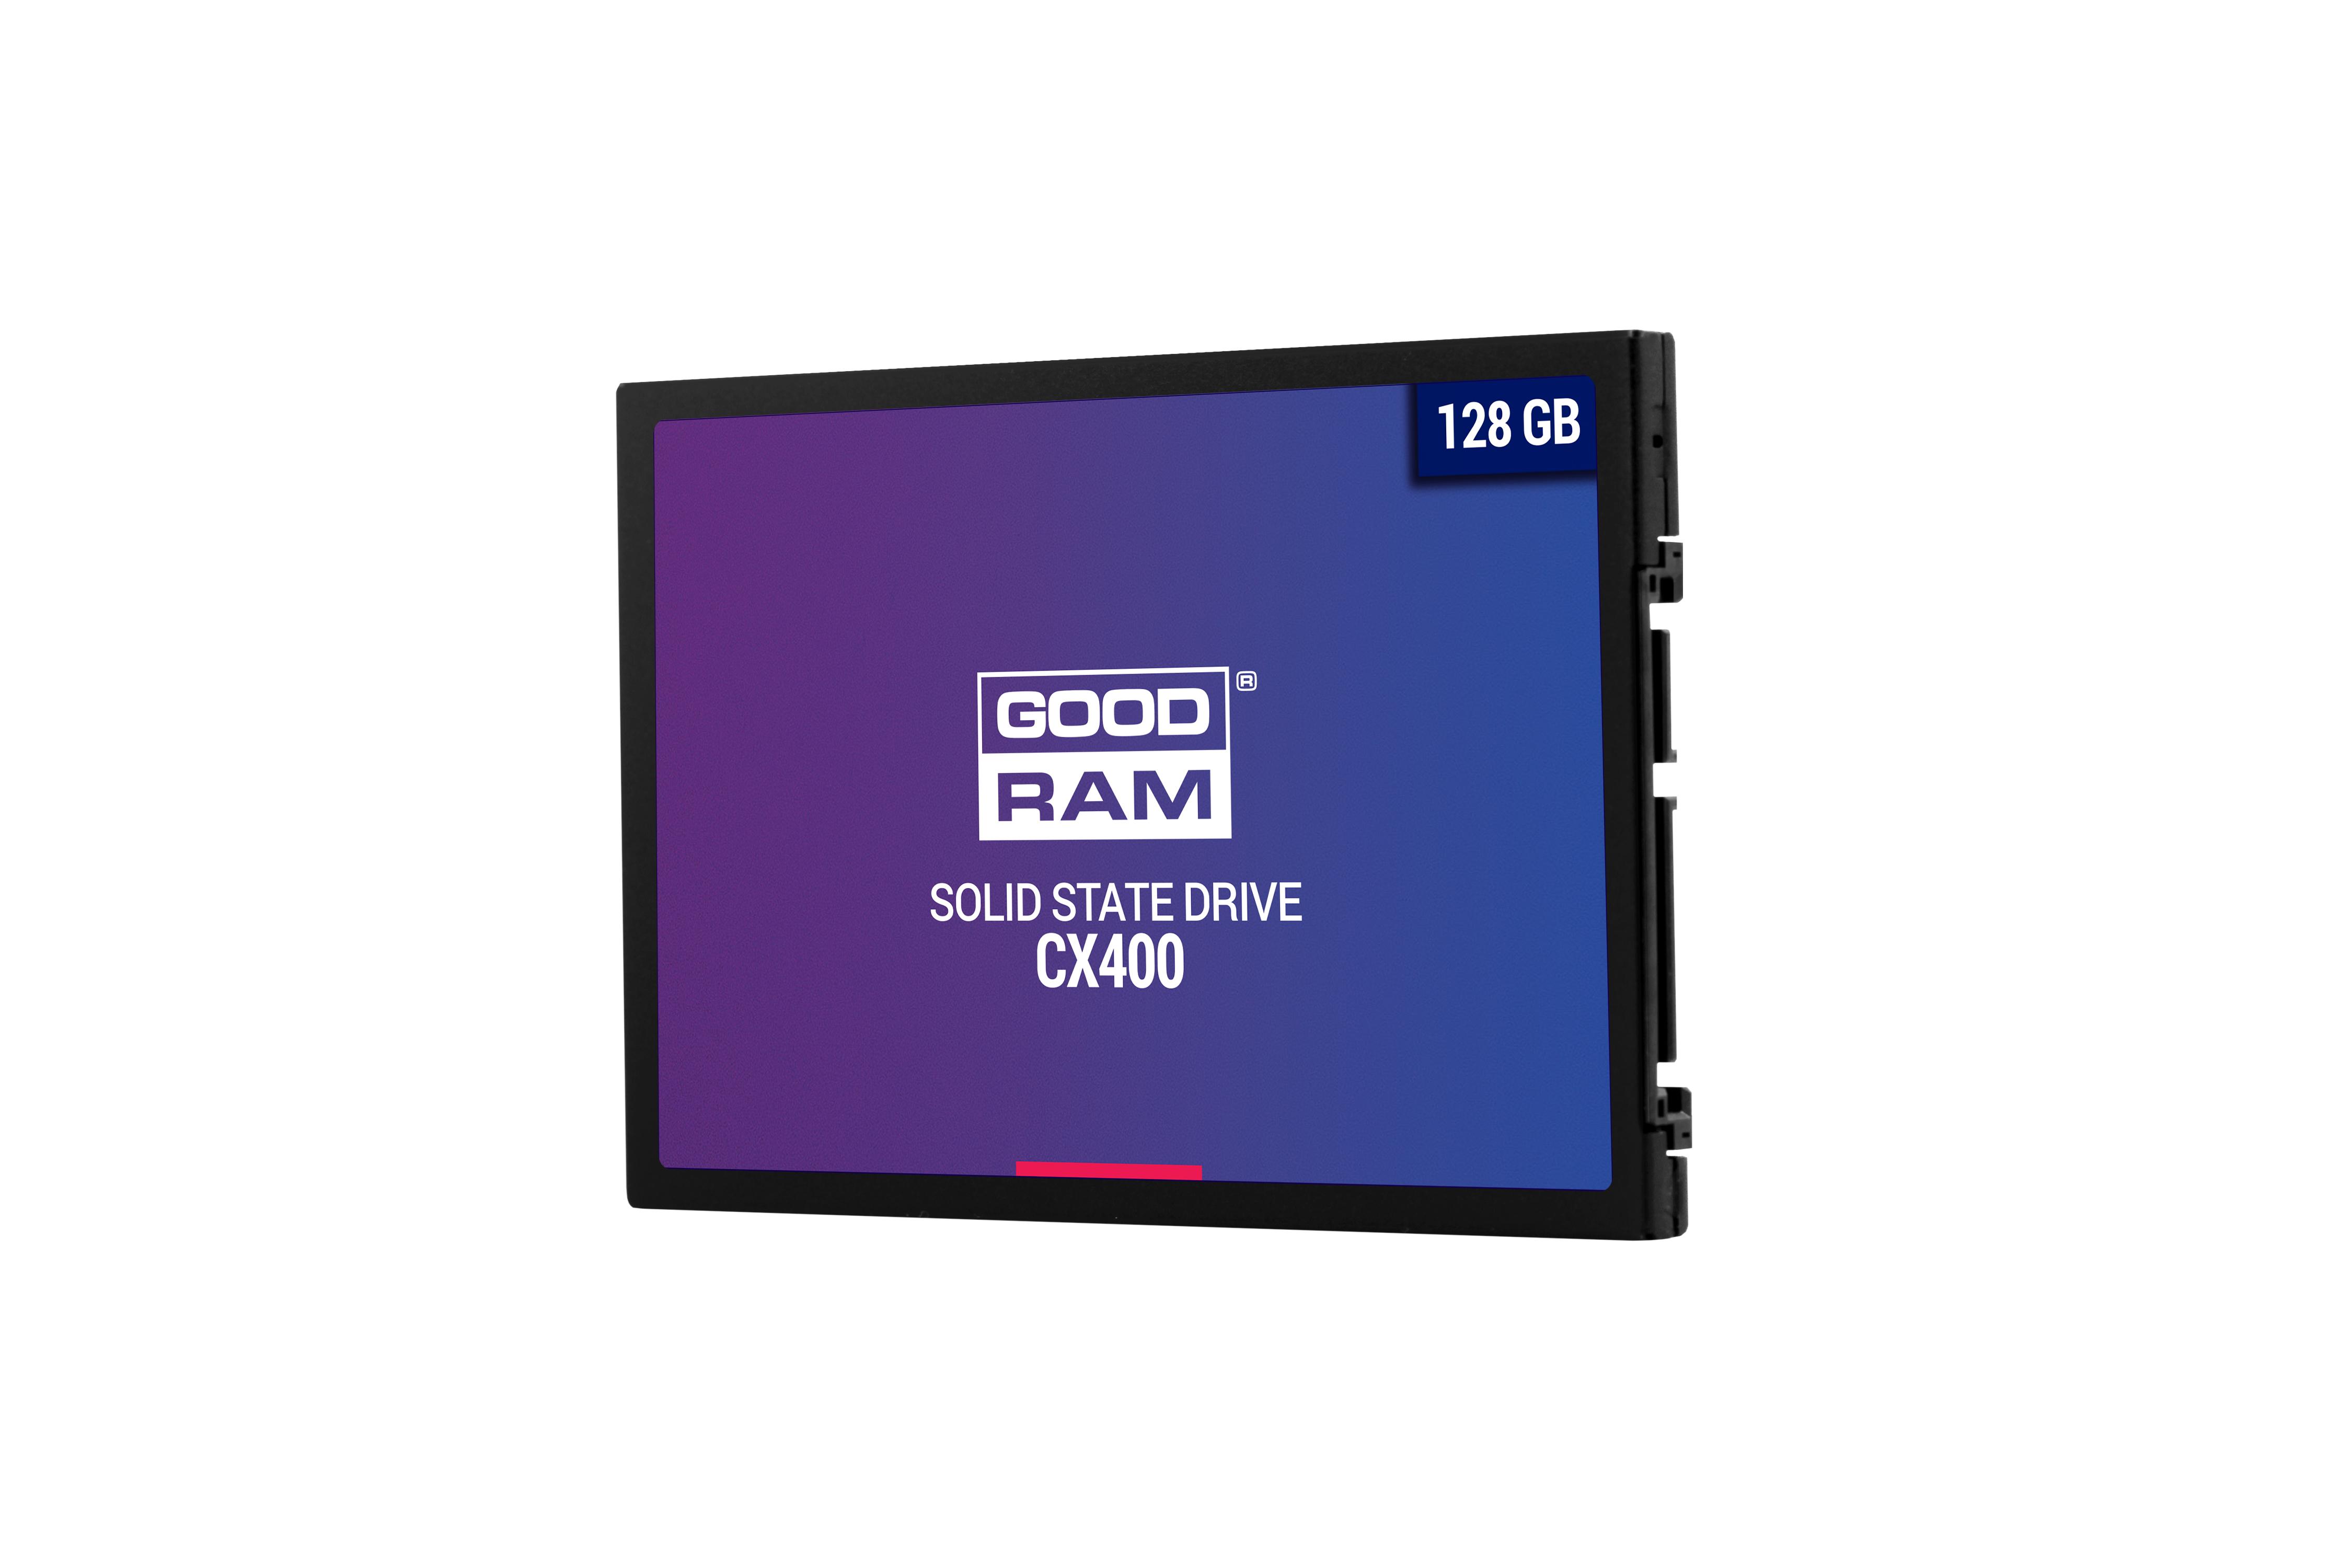 GOODRAM CX400, SSD 2.5, 256 GB SATA III, Phison S11, TLC, Retail